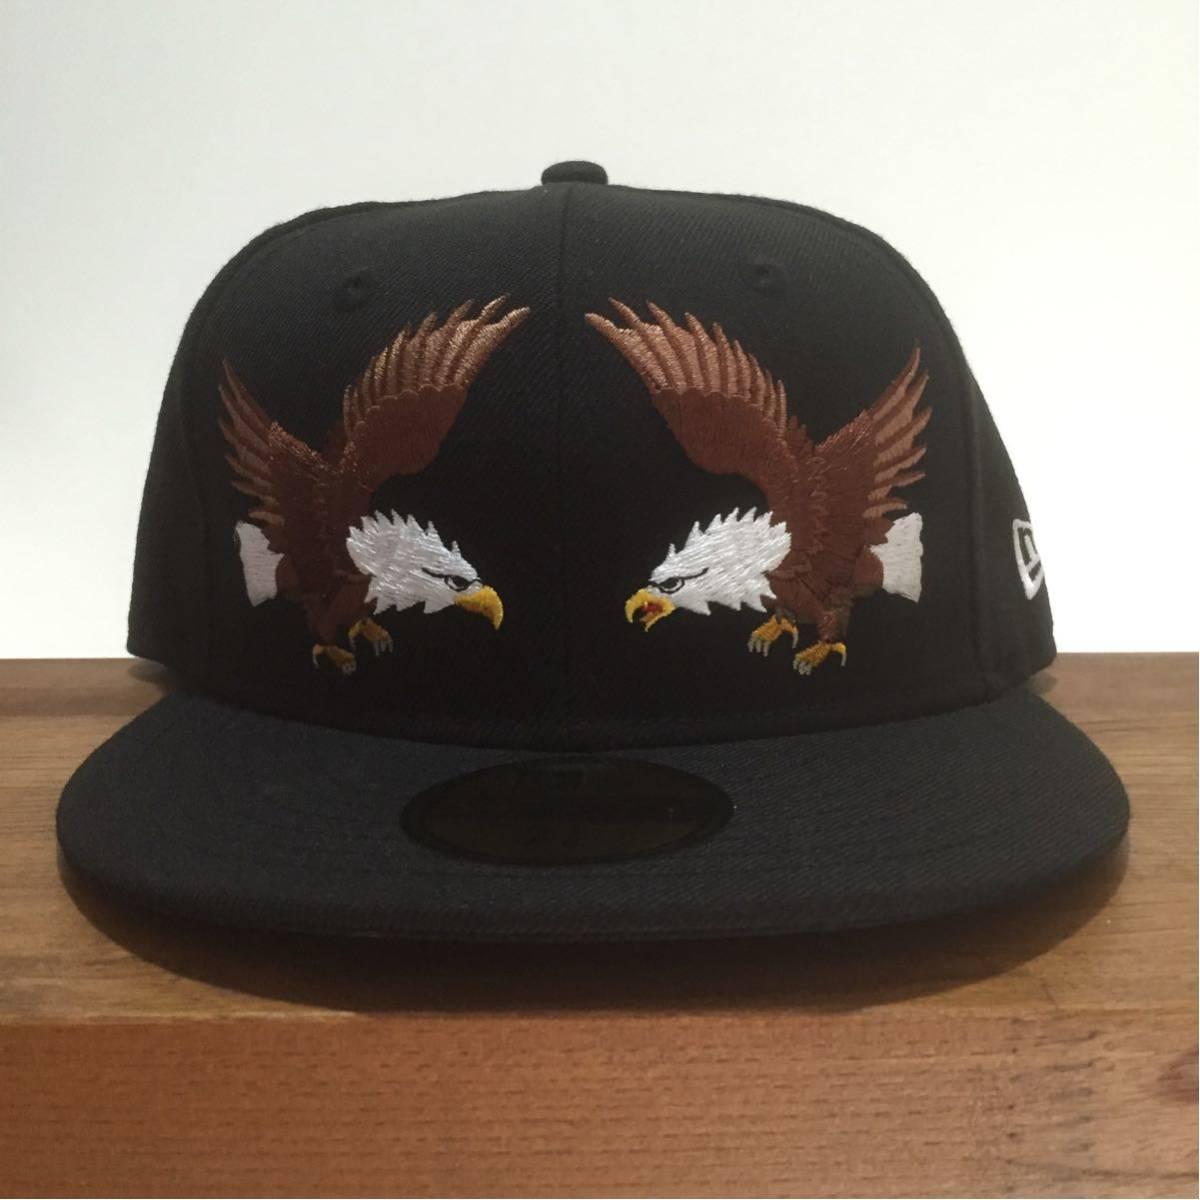 NEW ERA ニューエラ 59FIFTY スカジャンカスタム イーグル 鷲 刺繍 キャップ 帽子 野球帽 7 1/8 56.8cm 新品未使用 正規品 希少 限定 レア_画像1